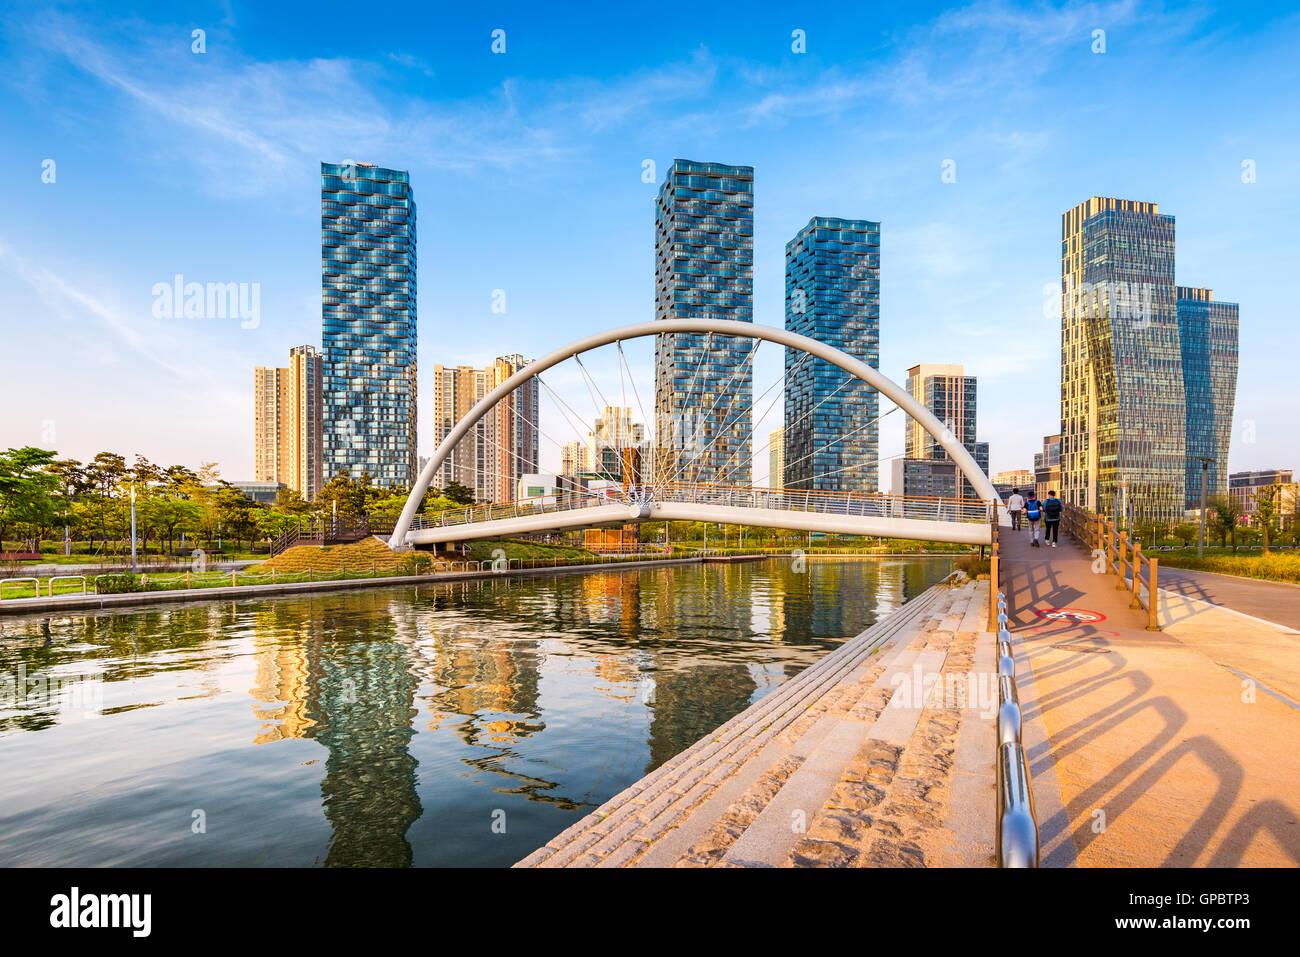 Incheon, Central Park in Songdo International Business District, South Korea Stockbild